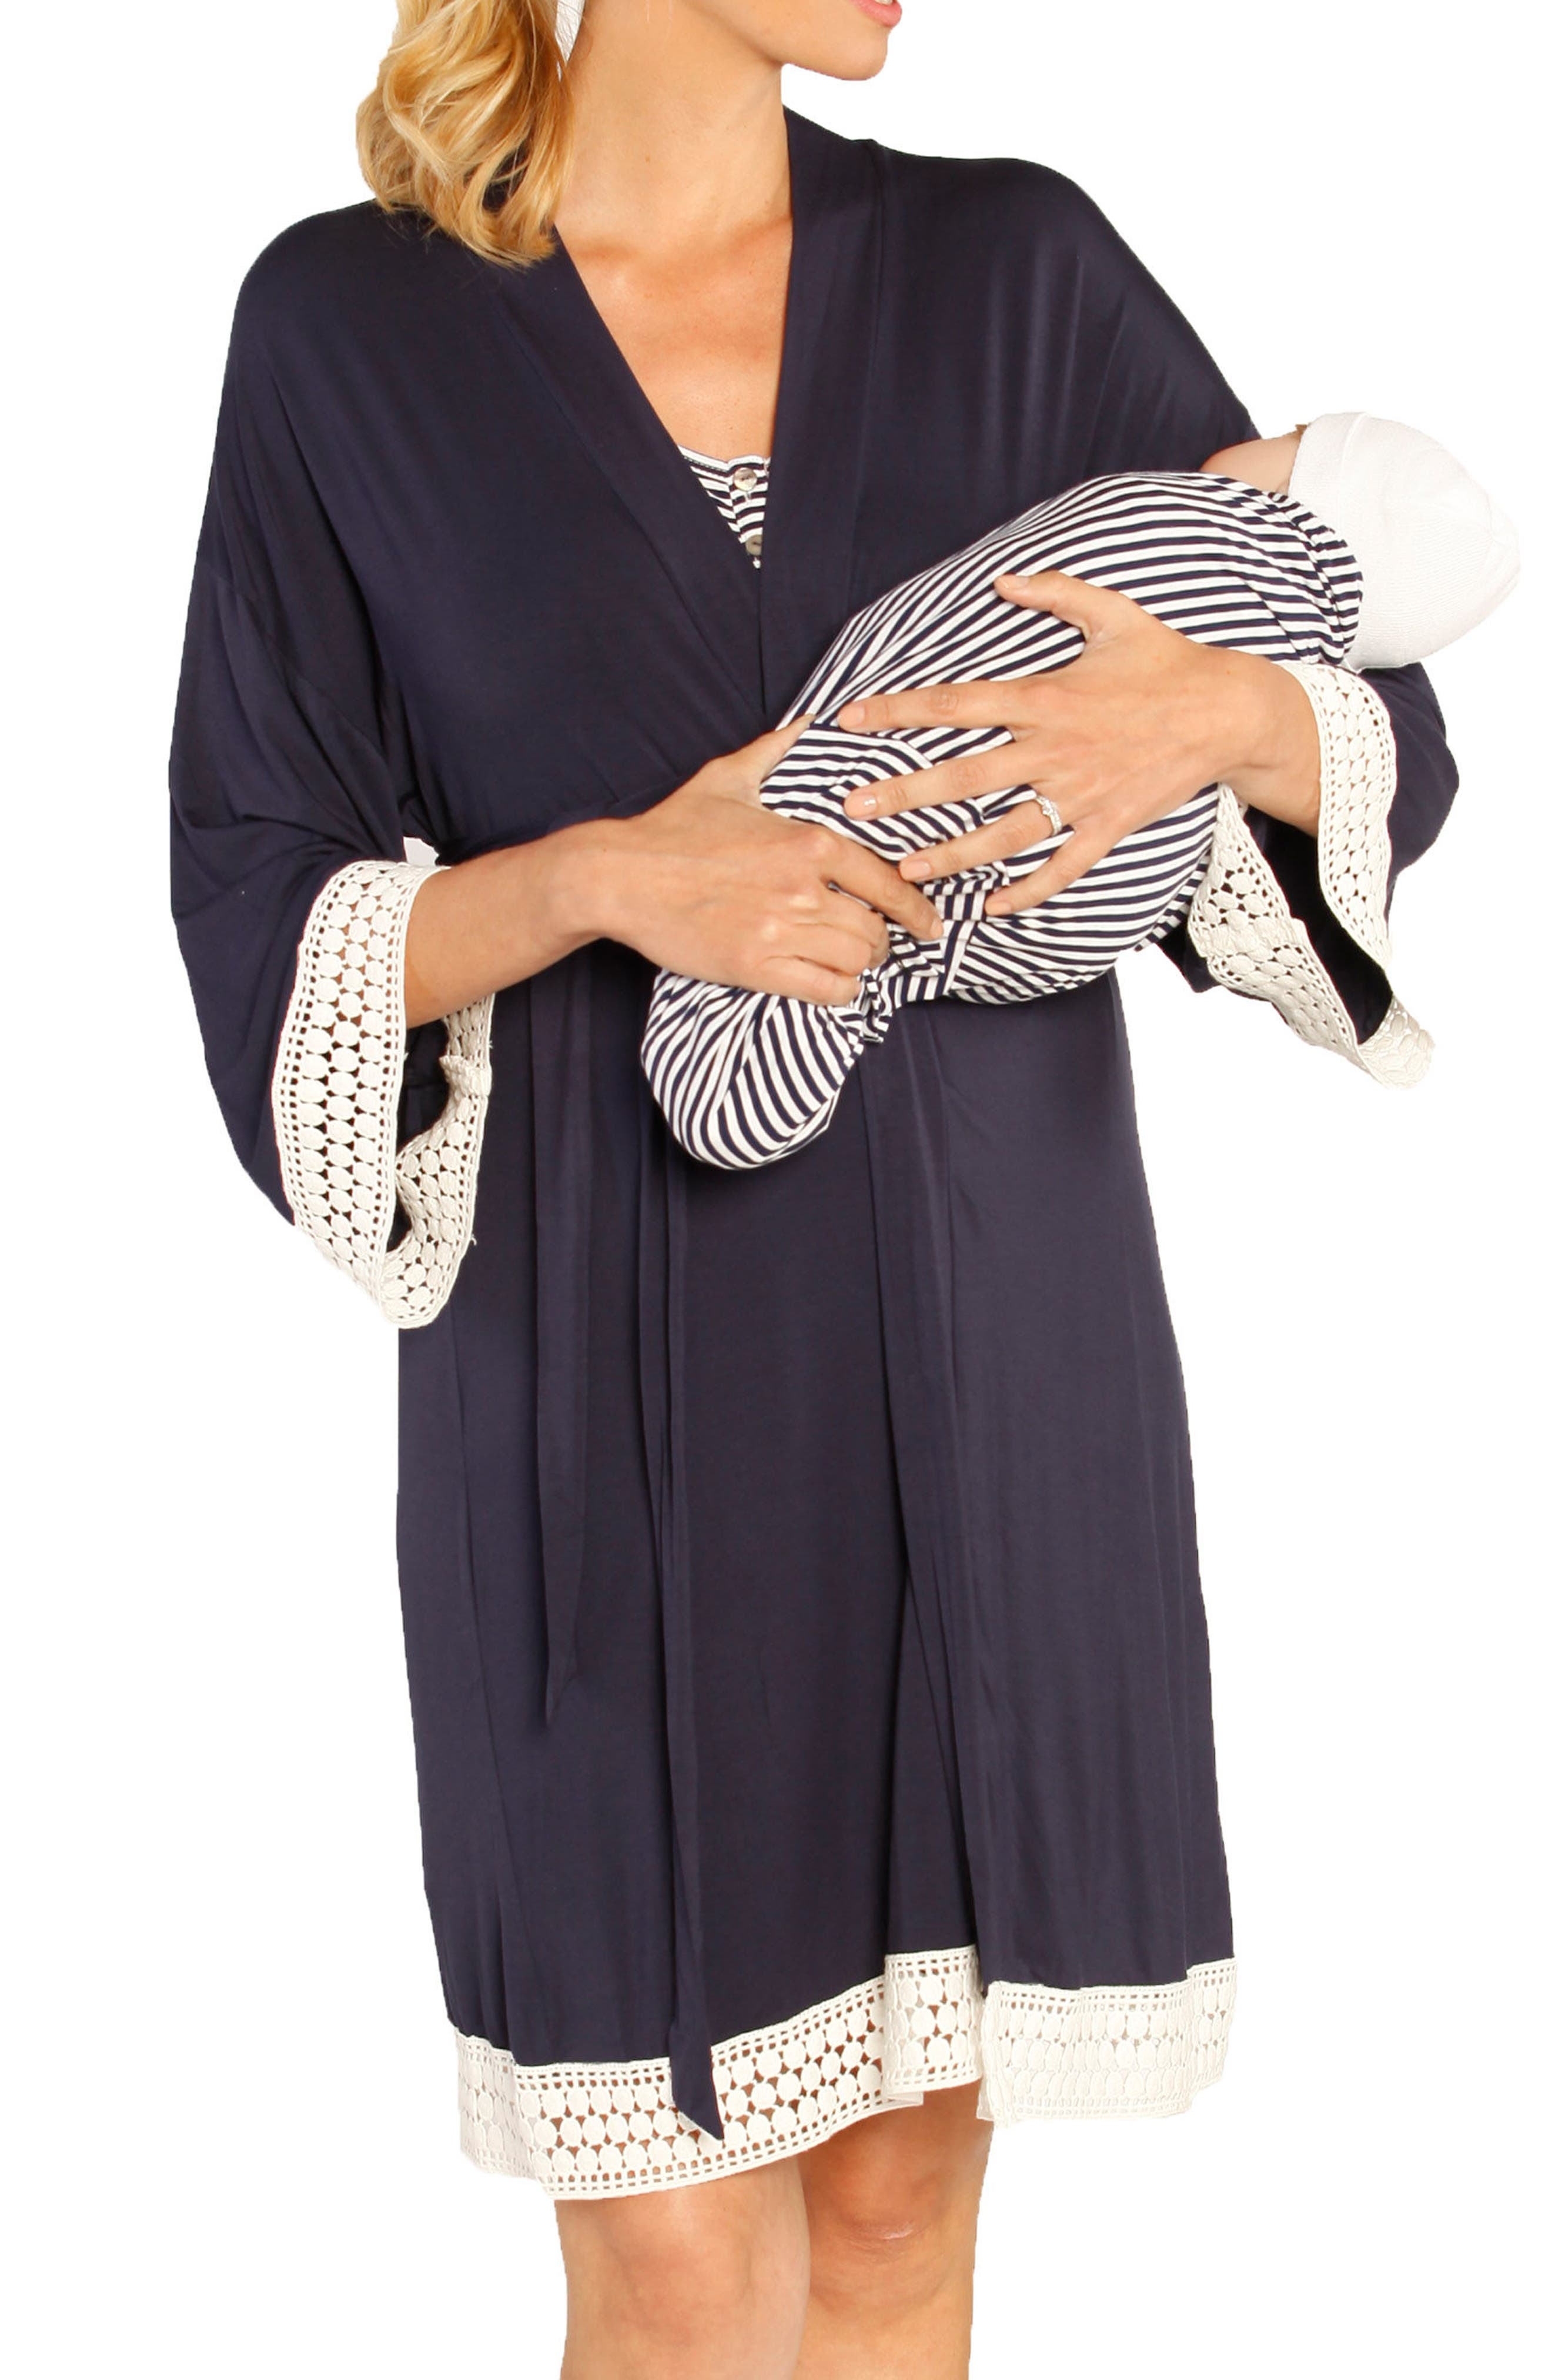 Nursing Dress, Robe & Baby Blanket Pouch Set,                             Main thumbnail 1, color,                             NAVY STRIPES